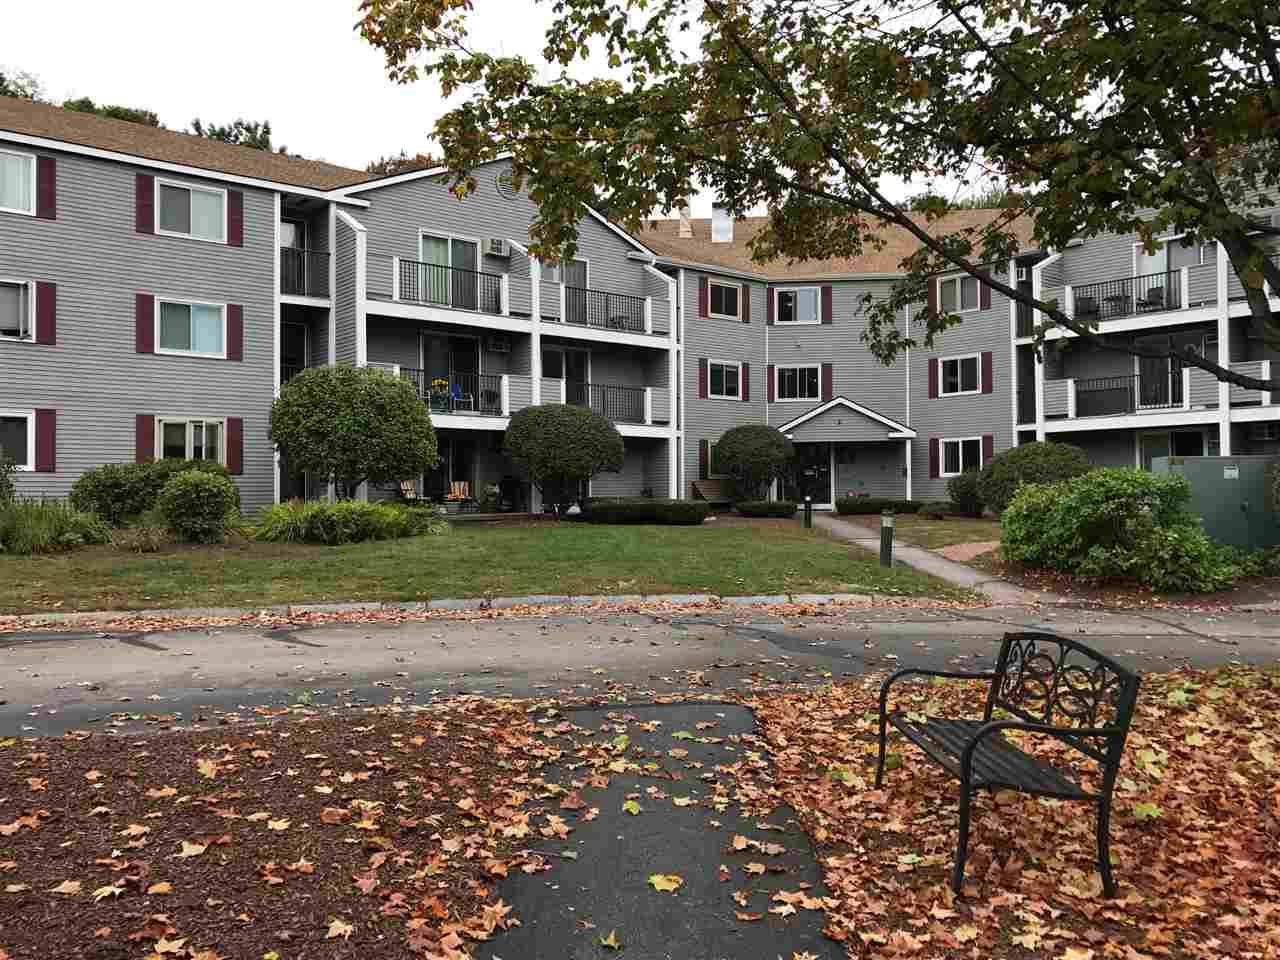 image of Concord NH Condo | sq.ft. 911